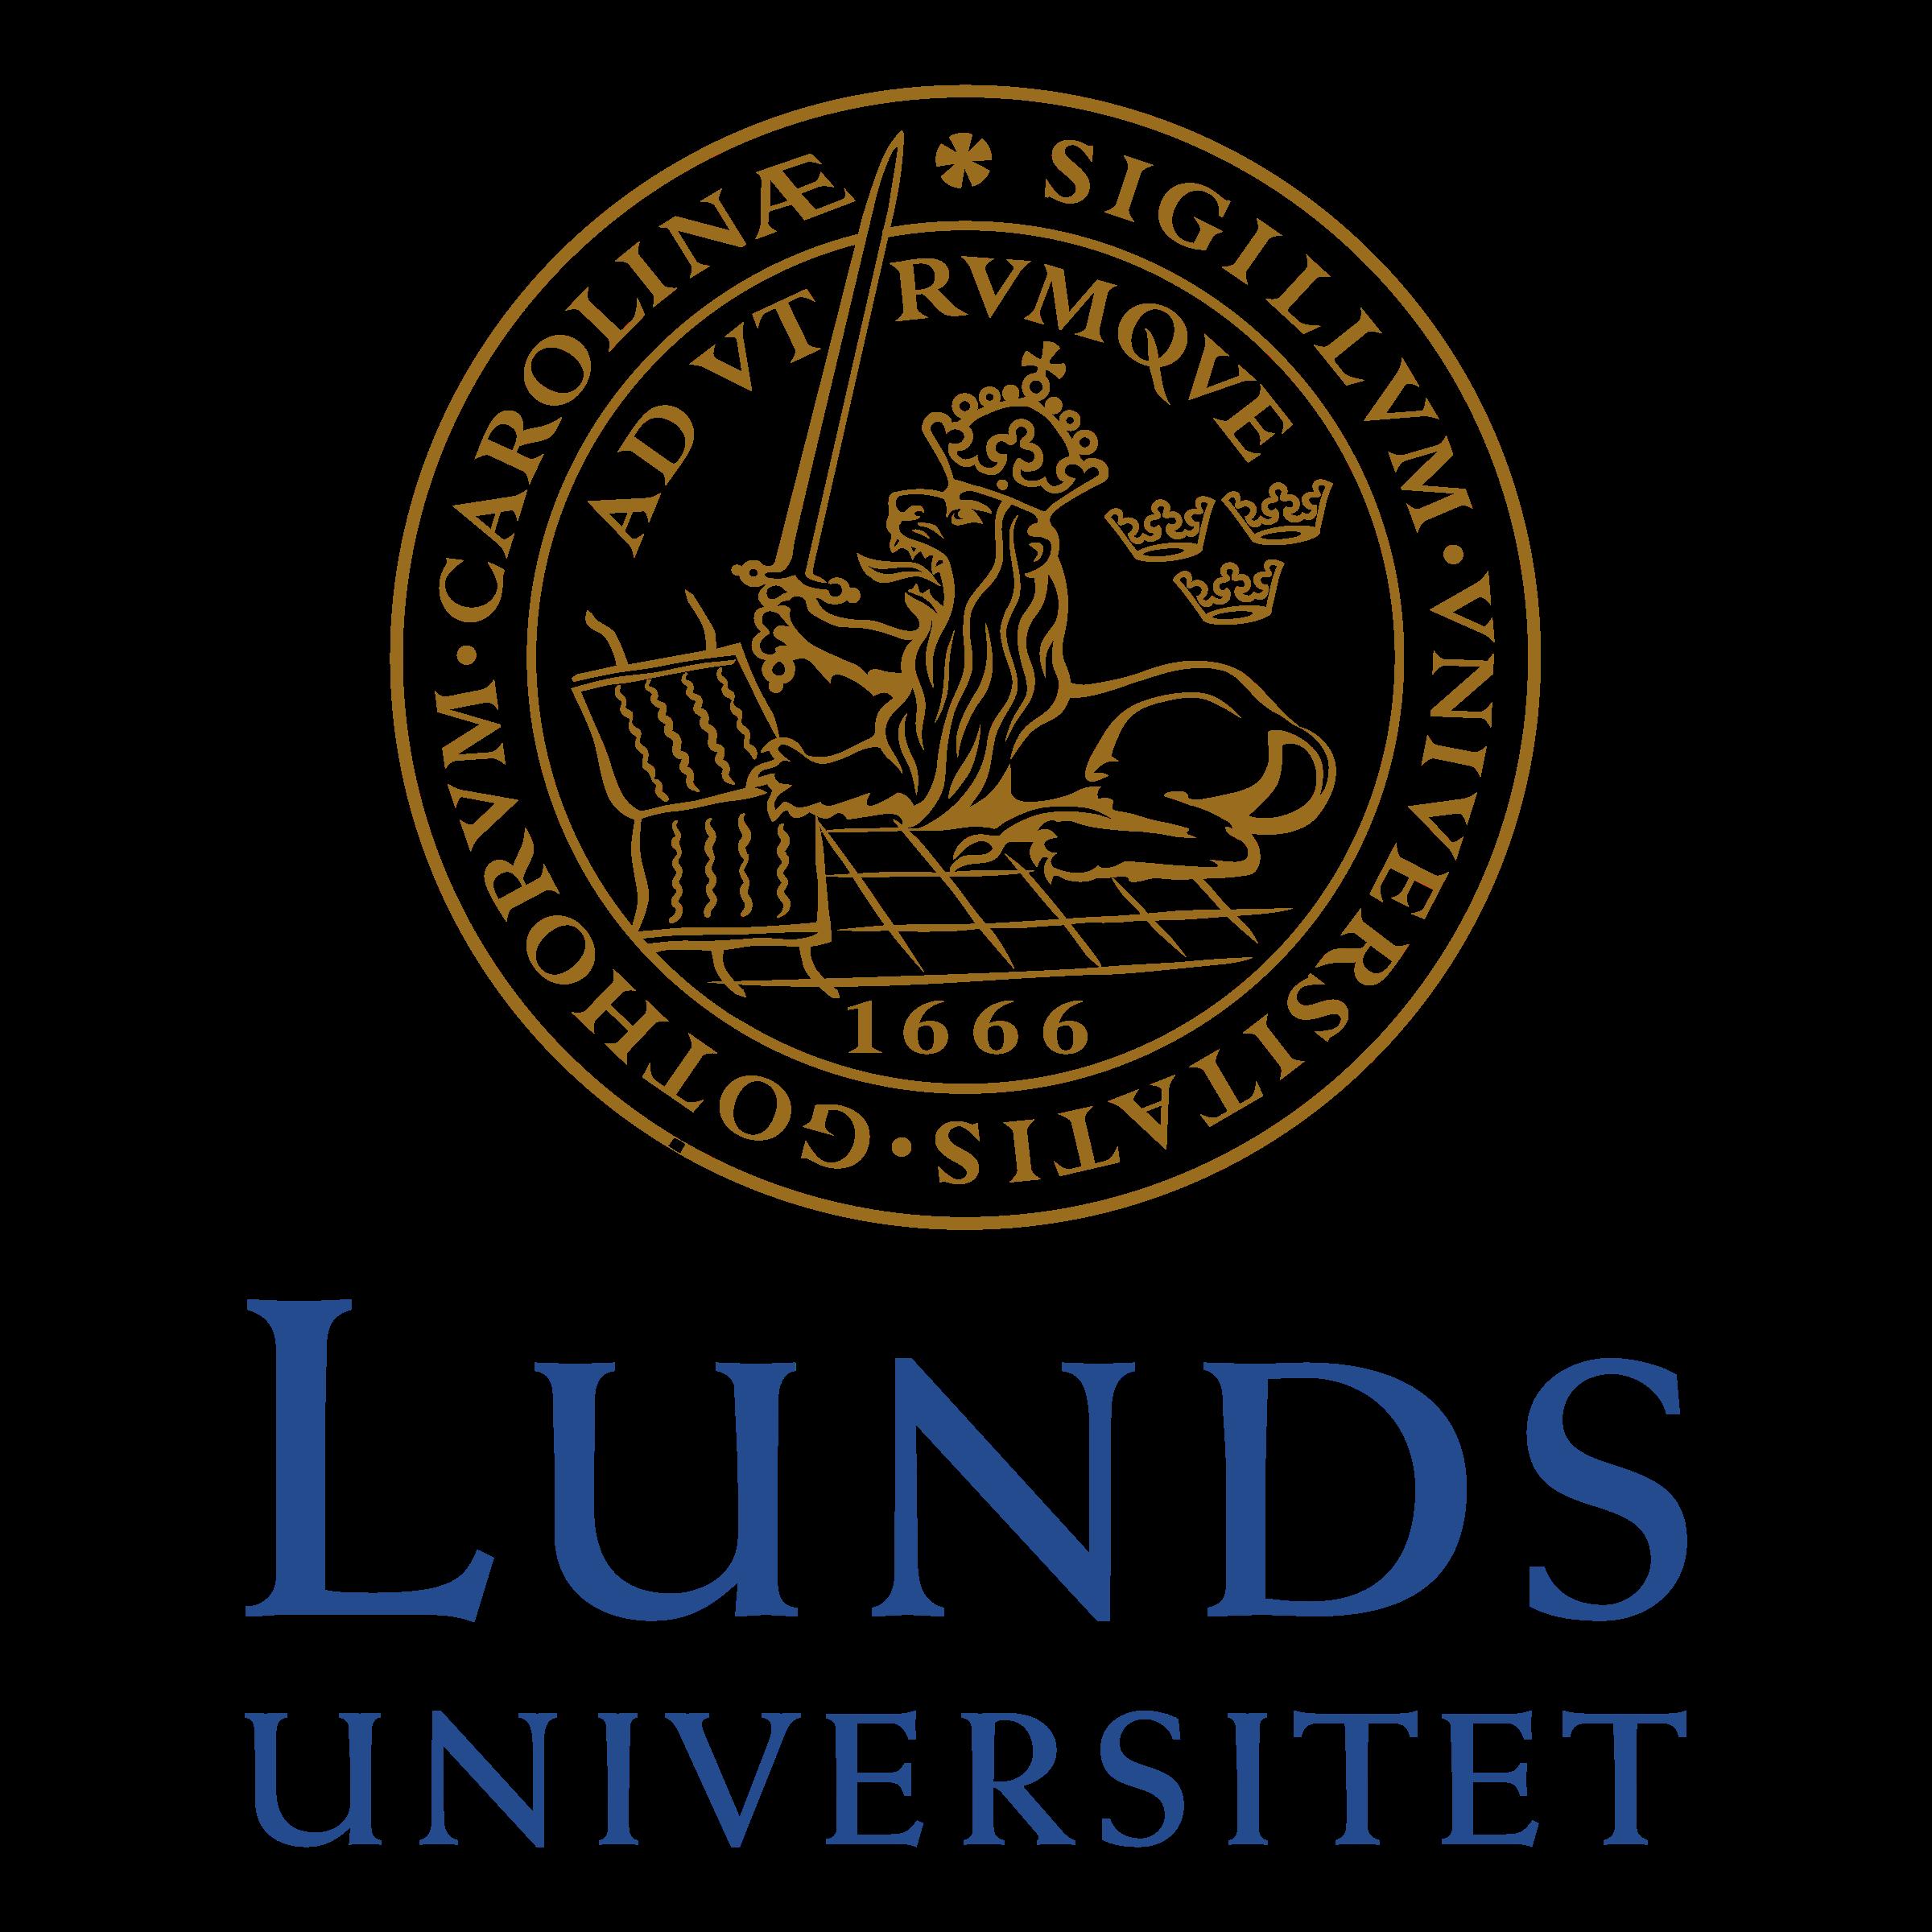 lunds-universitet-2-logo-png-transparent